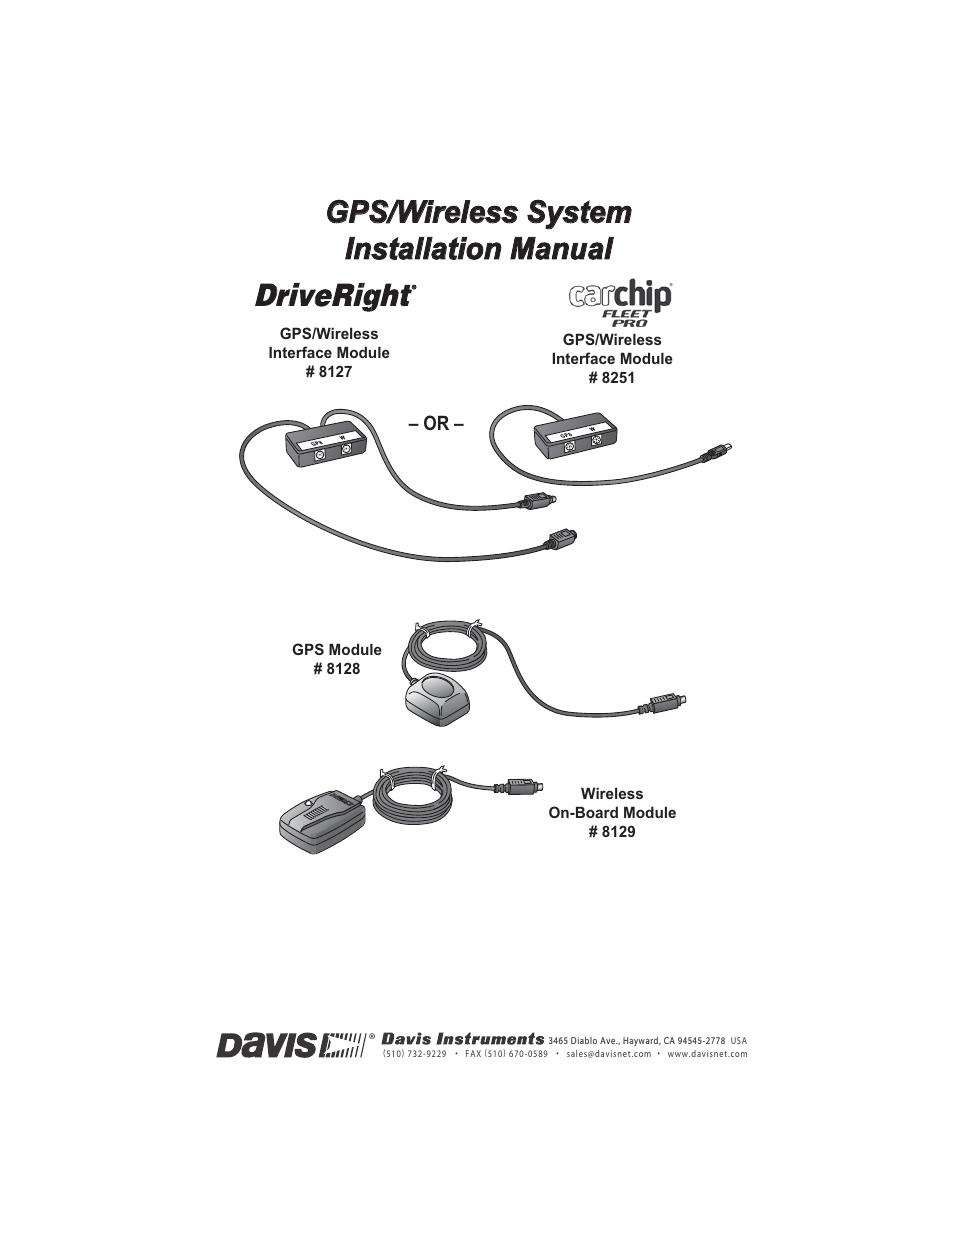 DAVIS DriveRight 8127